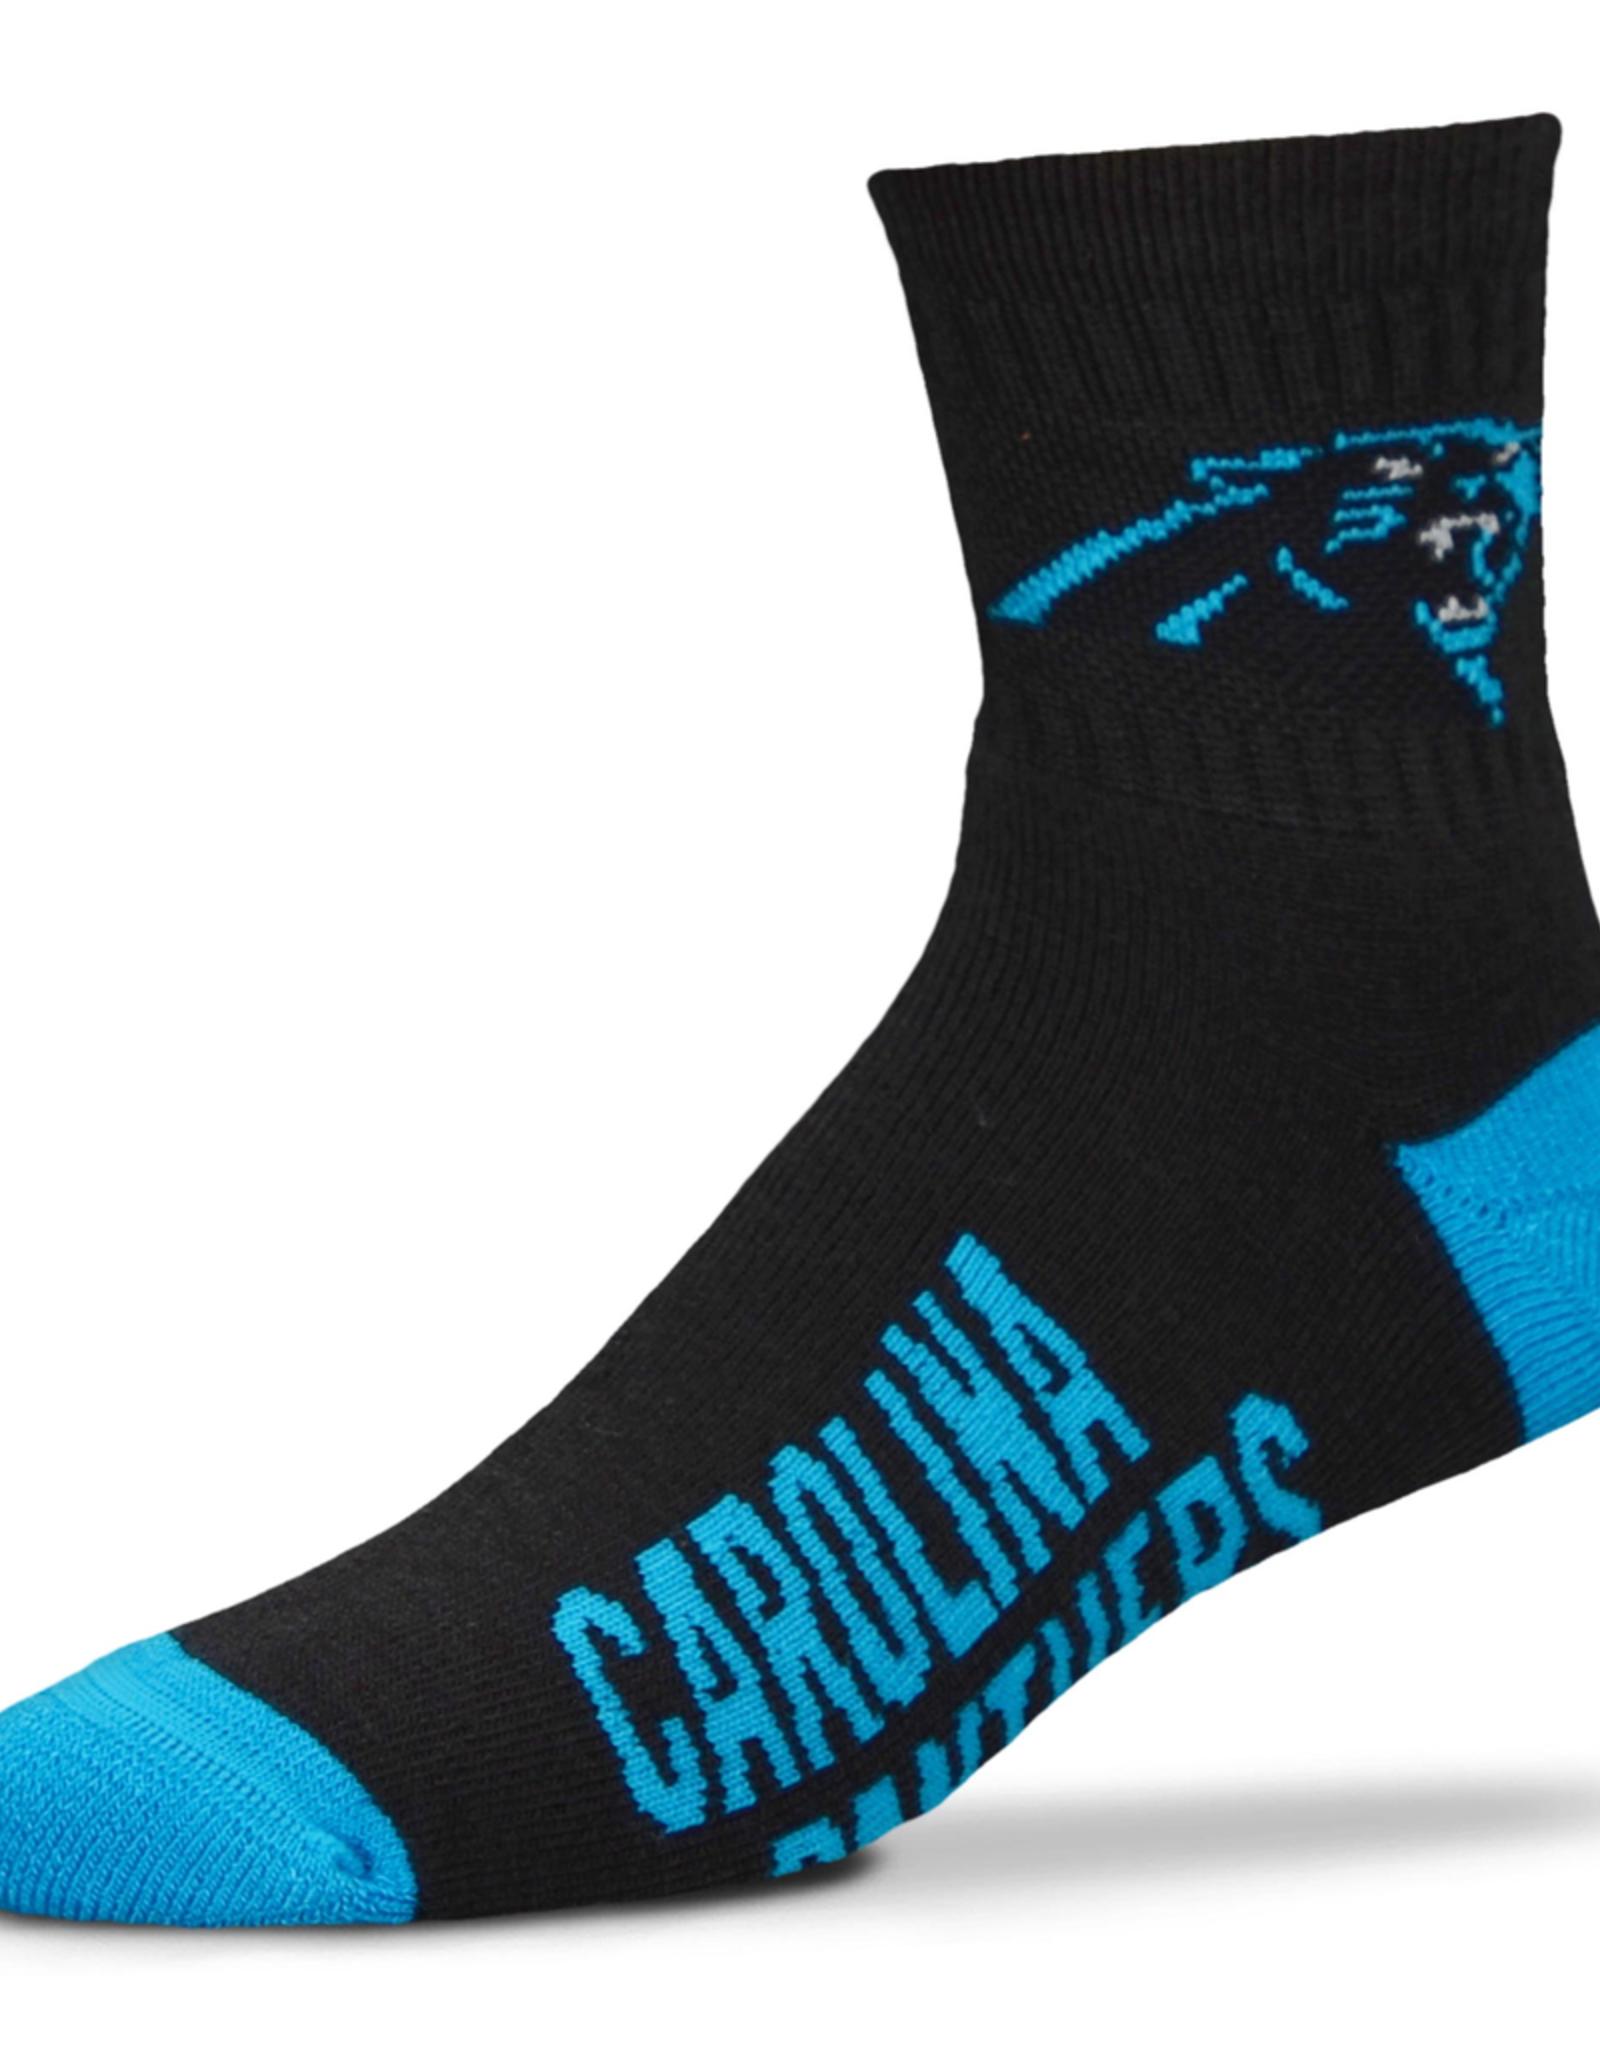 FOR BARE FEET Carolina Panthers Youth Team Socks